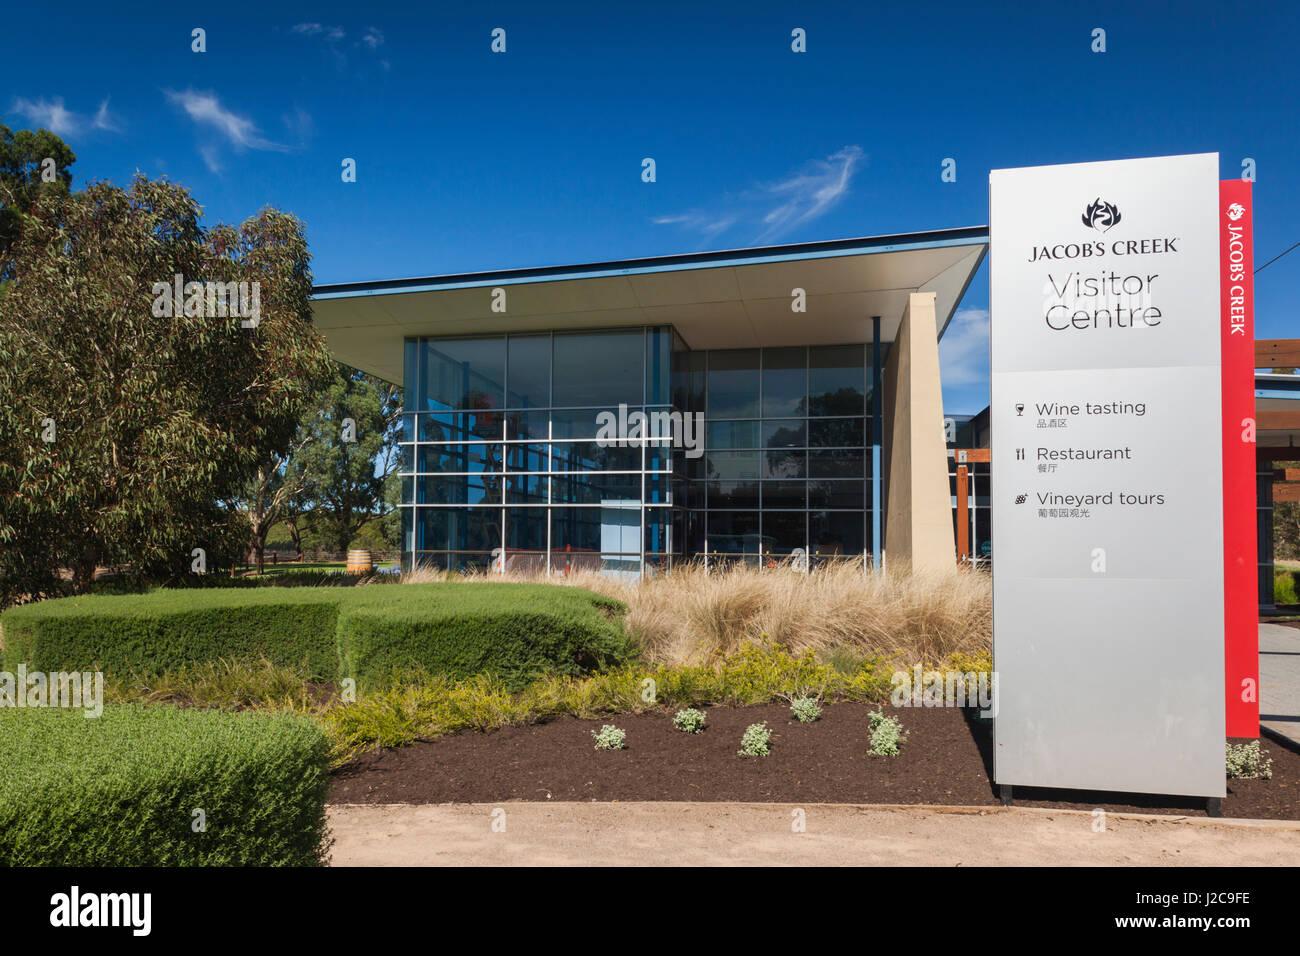 Australia Barossa Valley Rowland Flat Jacobu0027s Creek Winery visitor center exterior & Australia Barossa Valley Rowland Flat Jacobu0027s Creek Winery Stock ...